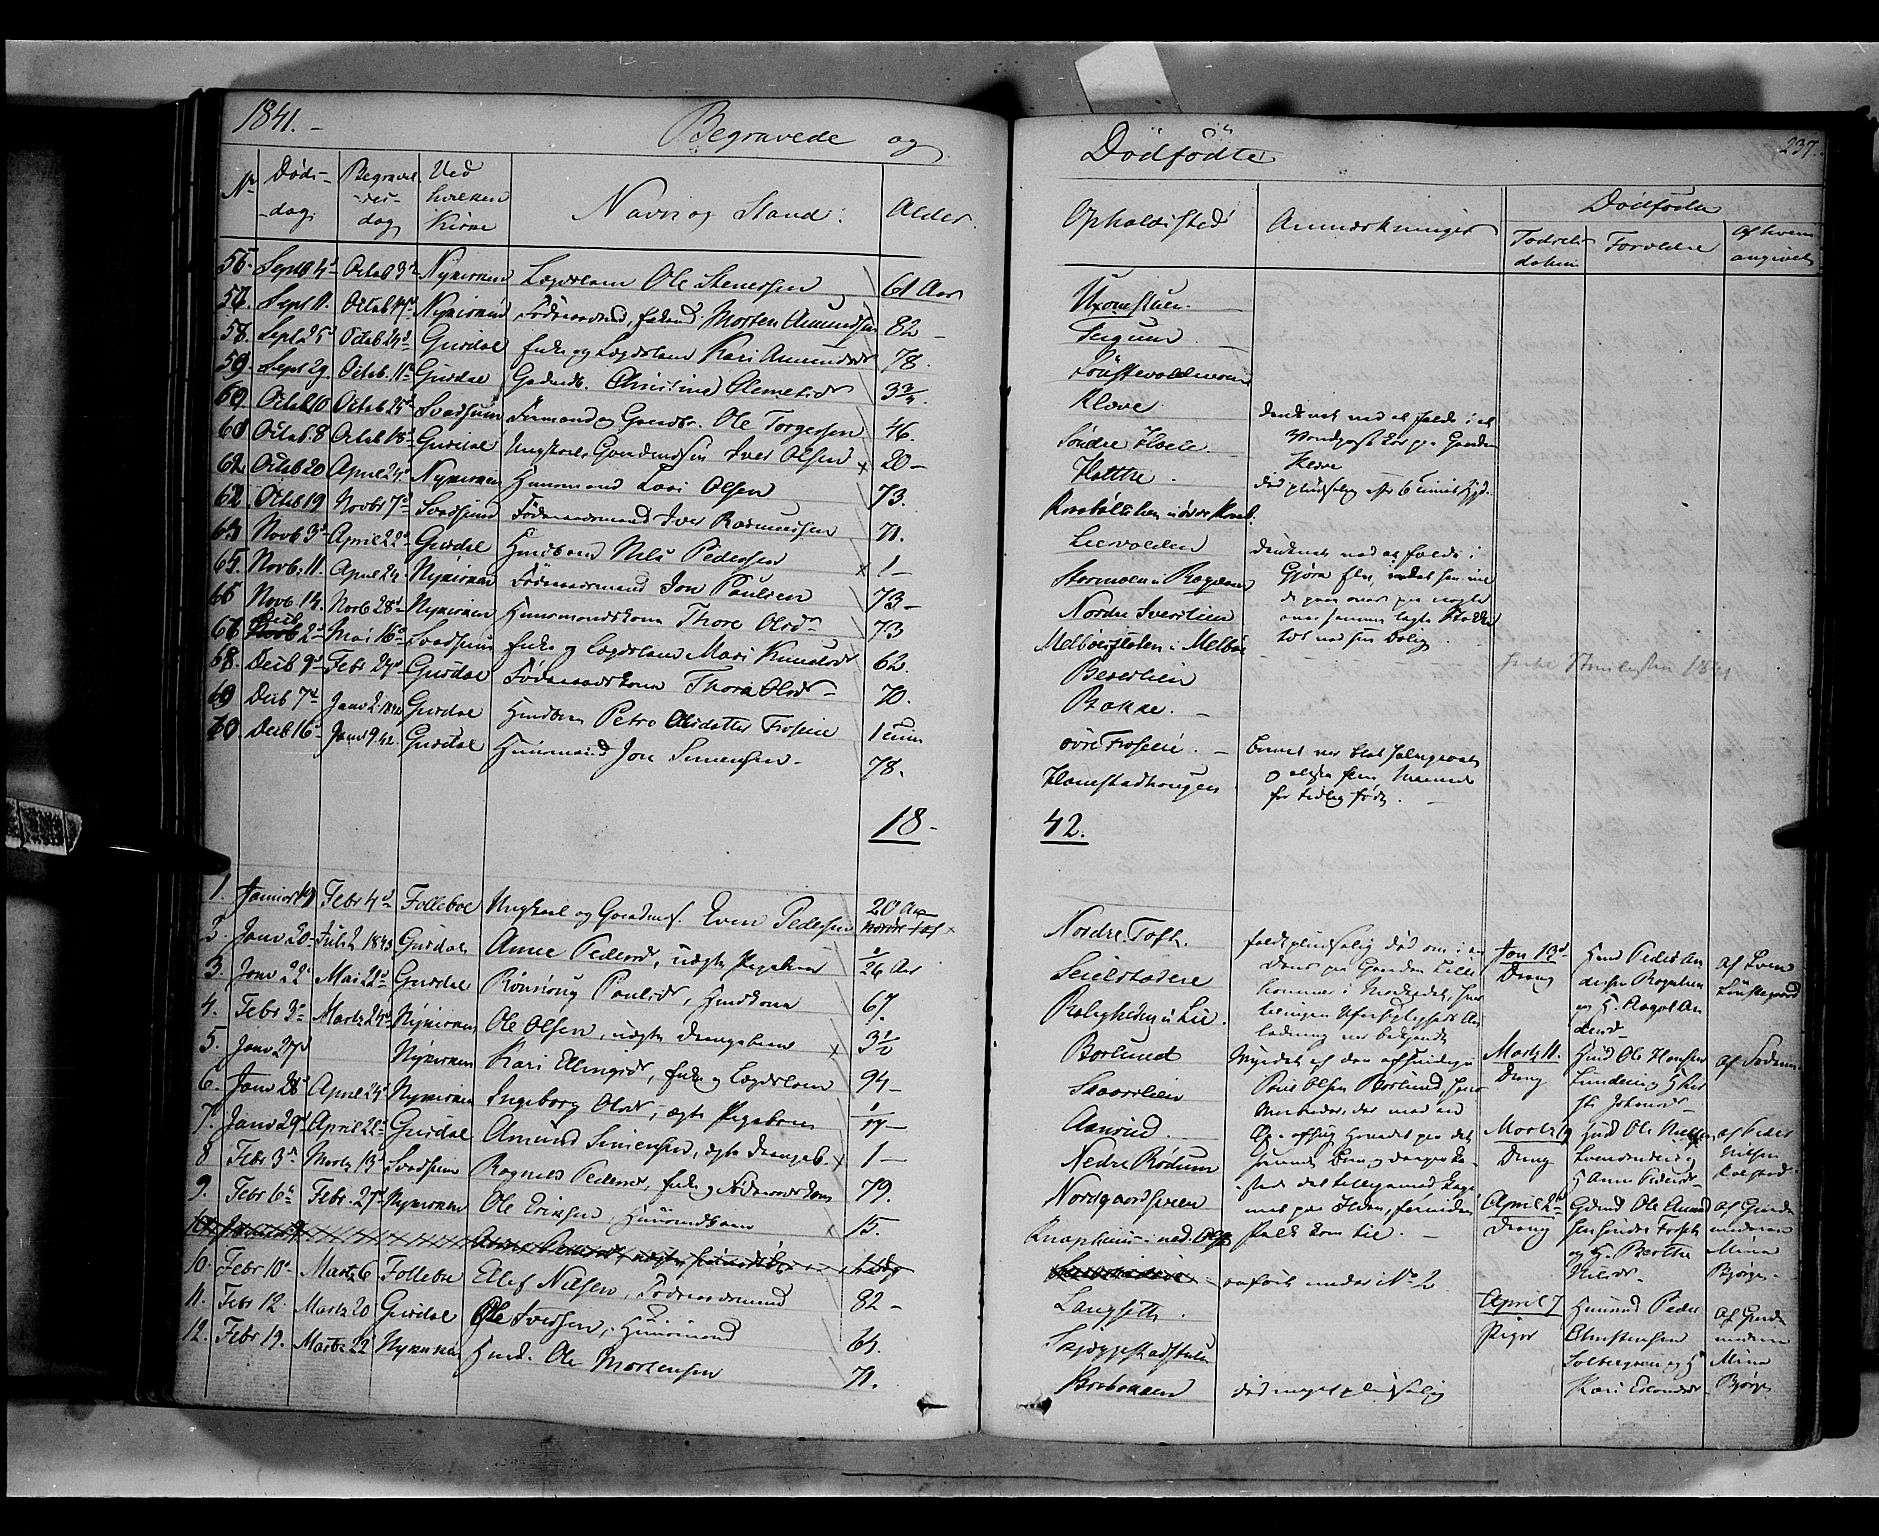 SAH, Gausdal prestekontor, Ministerialbok nr. 7, 1840-1850, s. 237